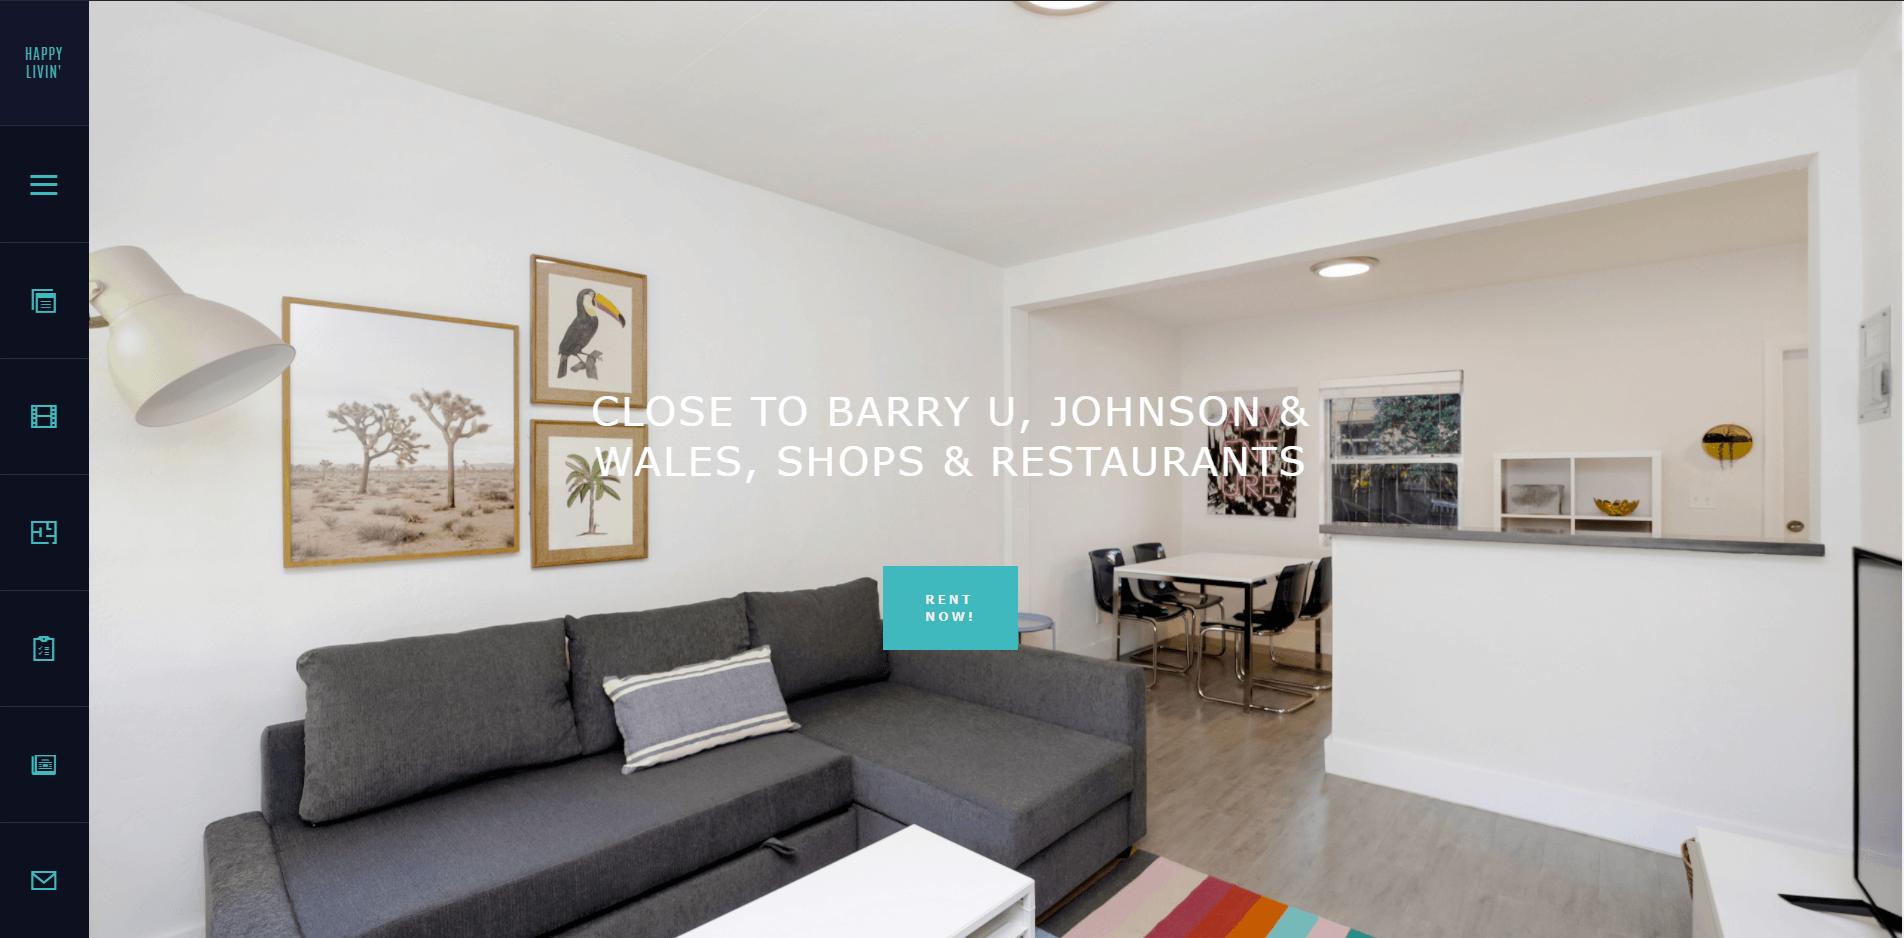 Miami Website Design & Development | Digital Agency | Klashtech